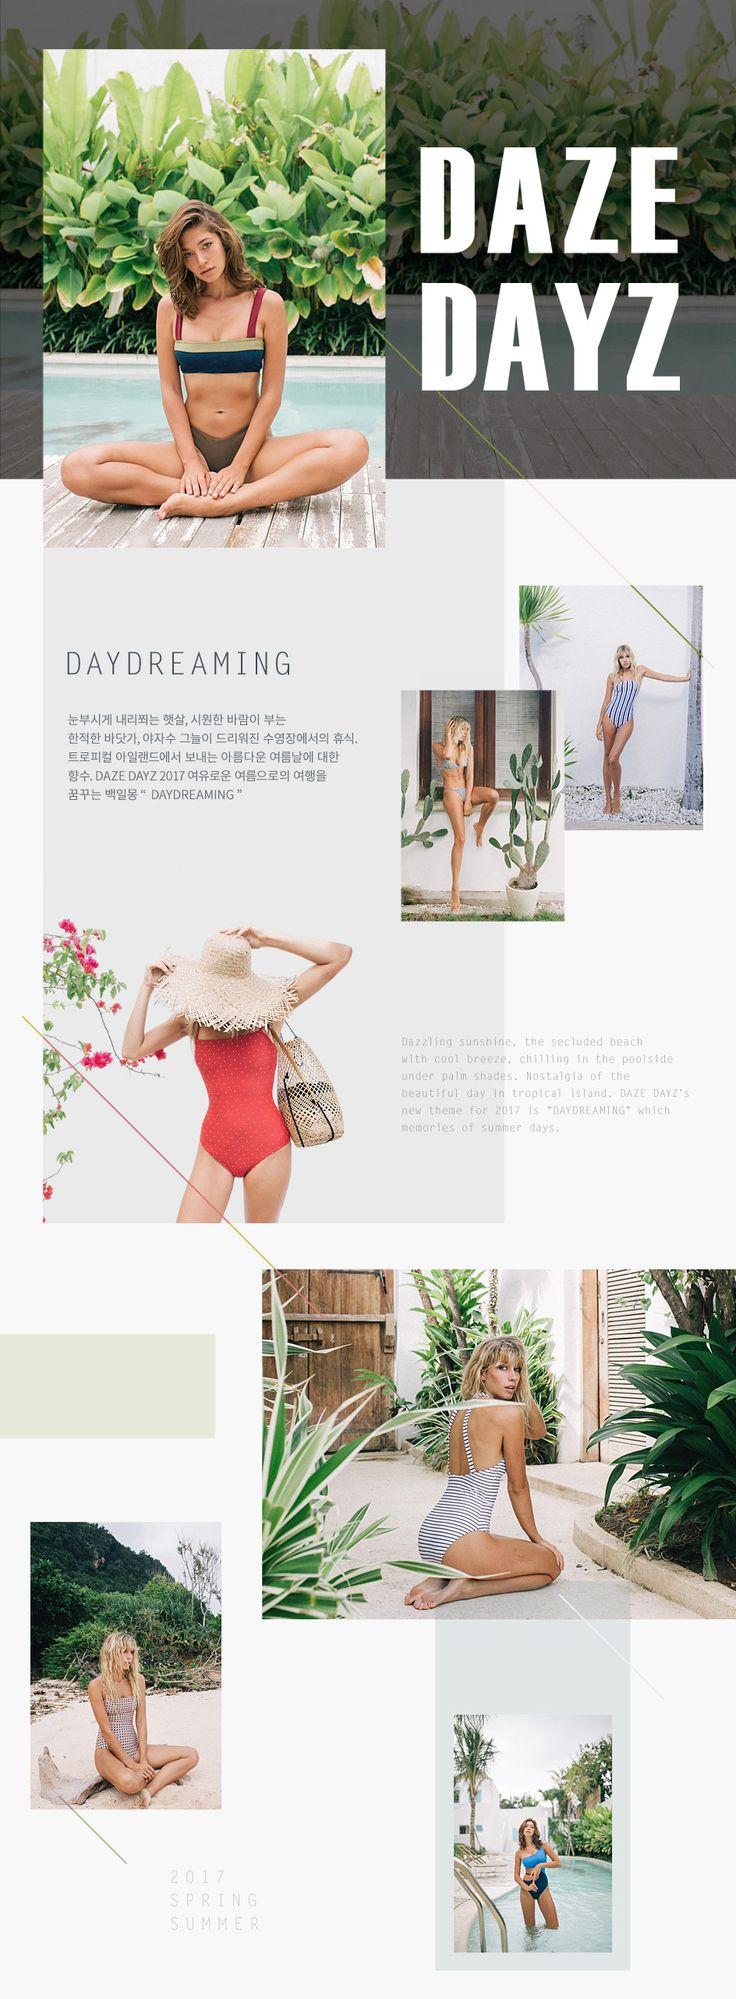 WIZWID:위즈위드 - 글로벌 쇼핑 네트워크 여성 의류 우먼 패션 스윔웨어 DAZE DAYZ 여유로운 여름으로의 여행 데이즈데이즈 17 썸머 컬렉션